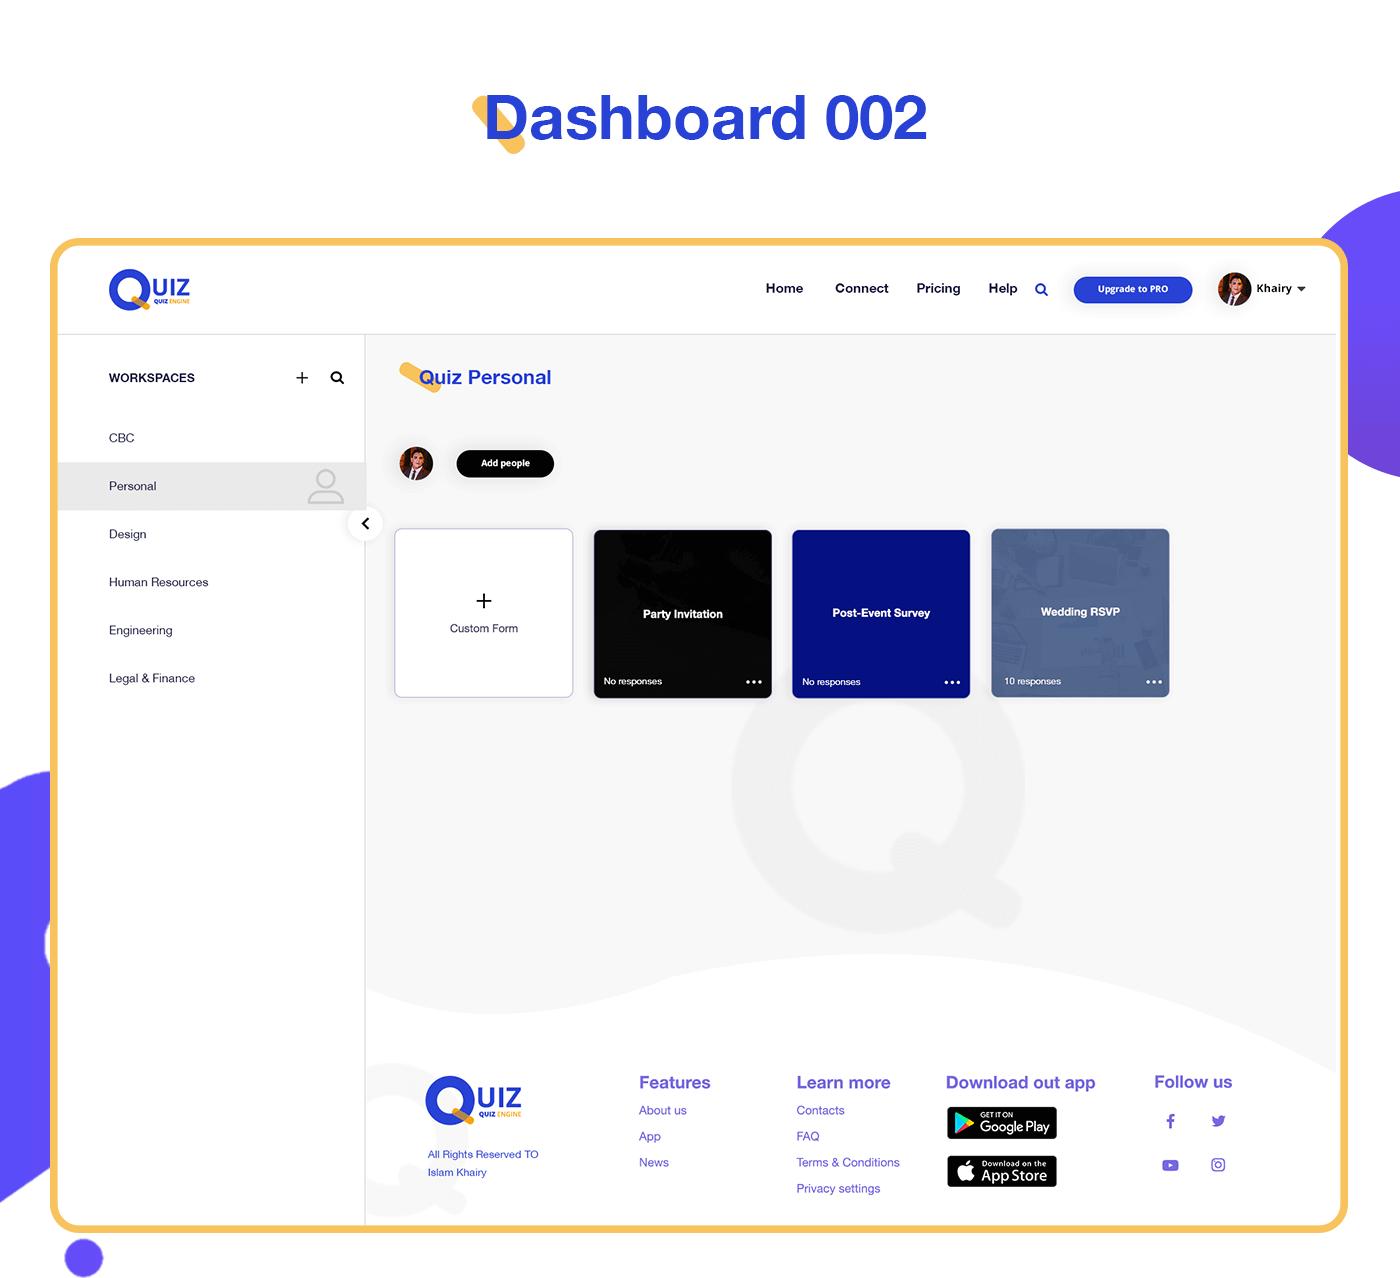 UI ux Webdesign uxdesign UserExperience Interface UI/UX dashboard uesr interfase Quiz